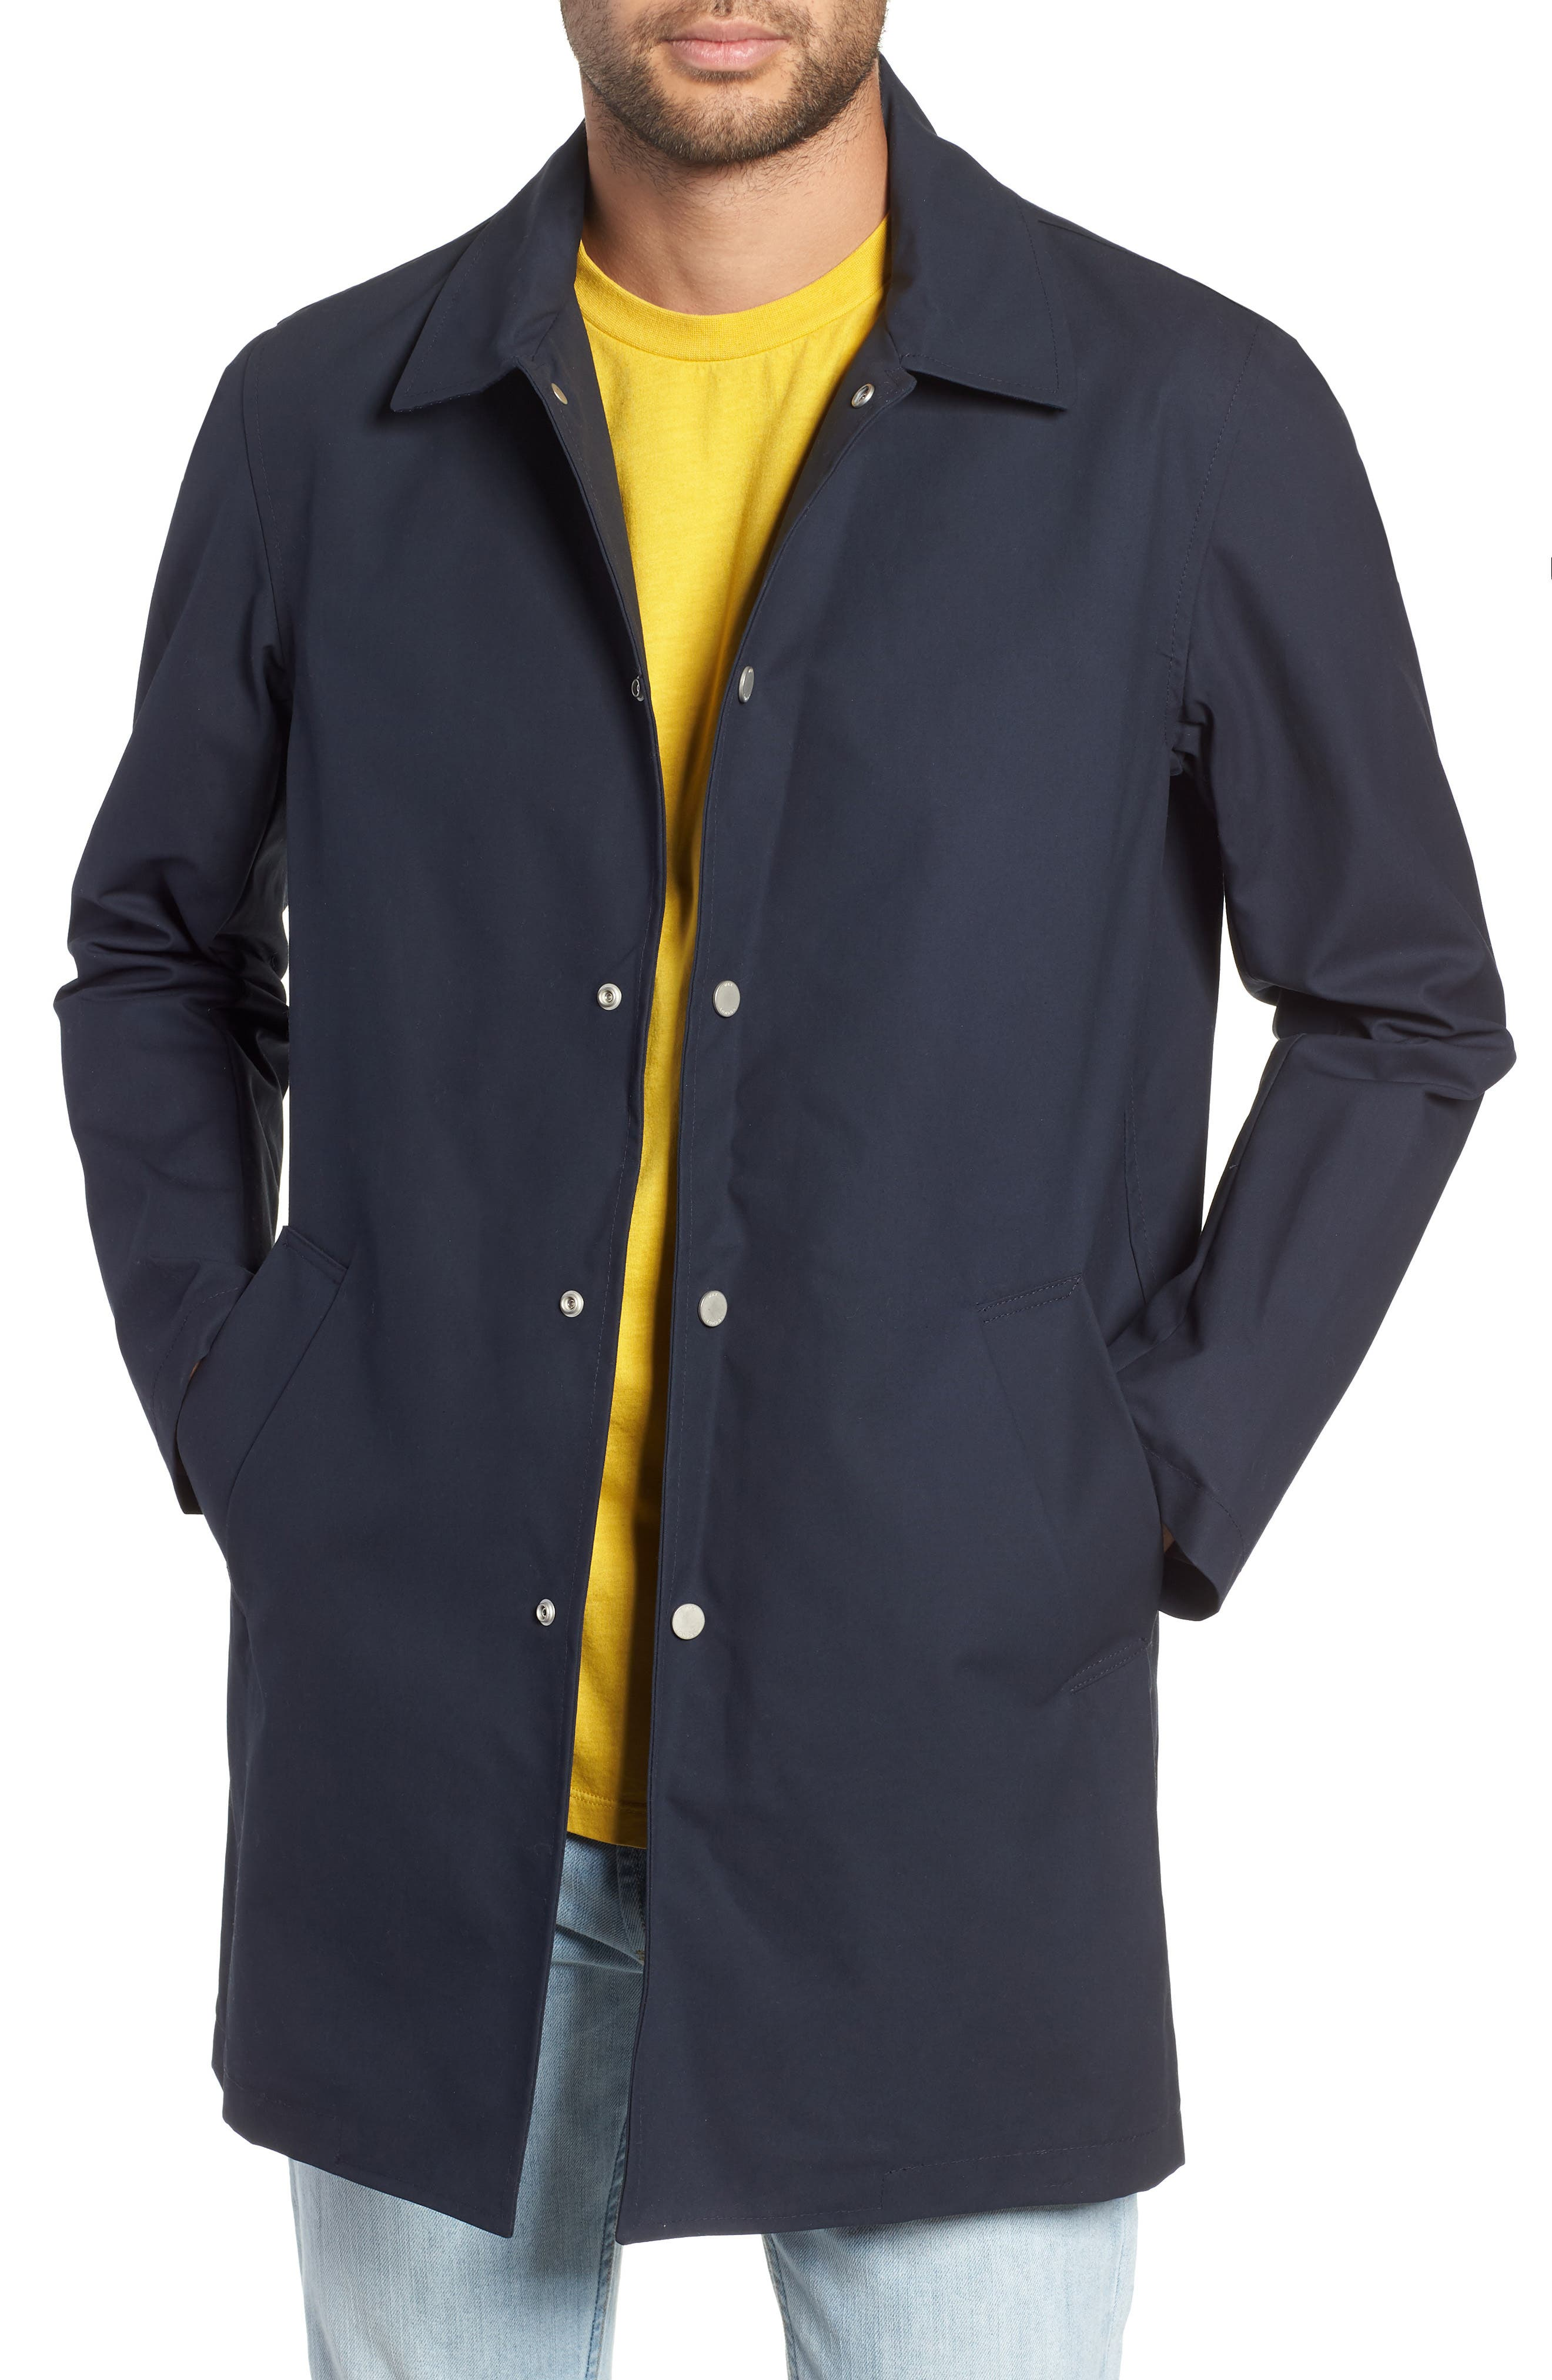 Navarino Waxed Mac Jacket,                             Main thumbnail 1, color,                             NAVY